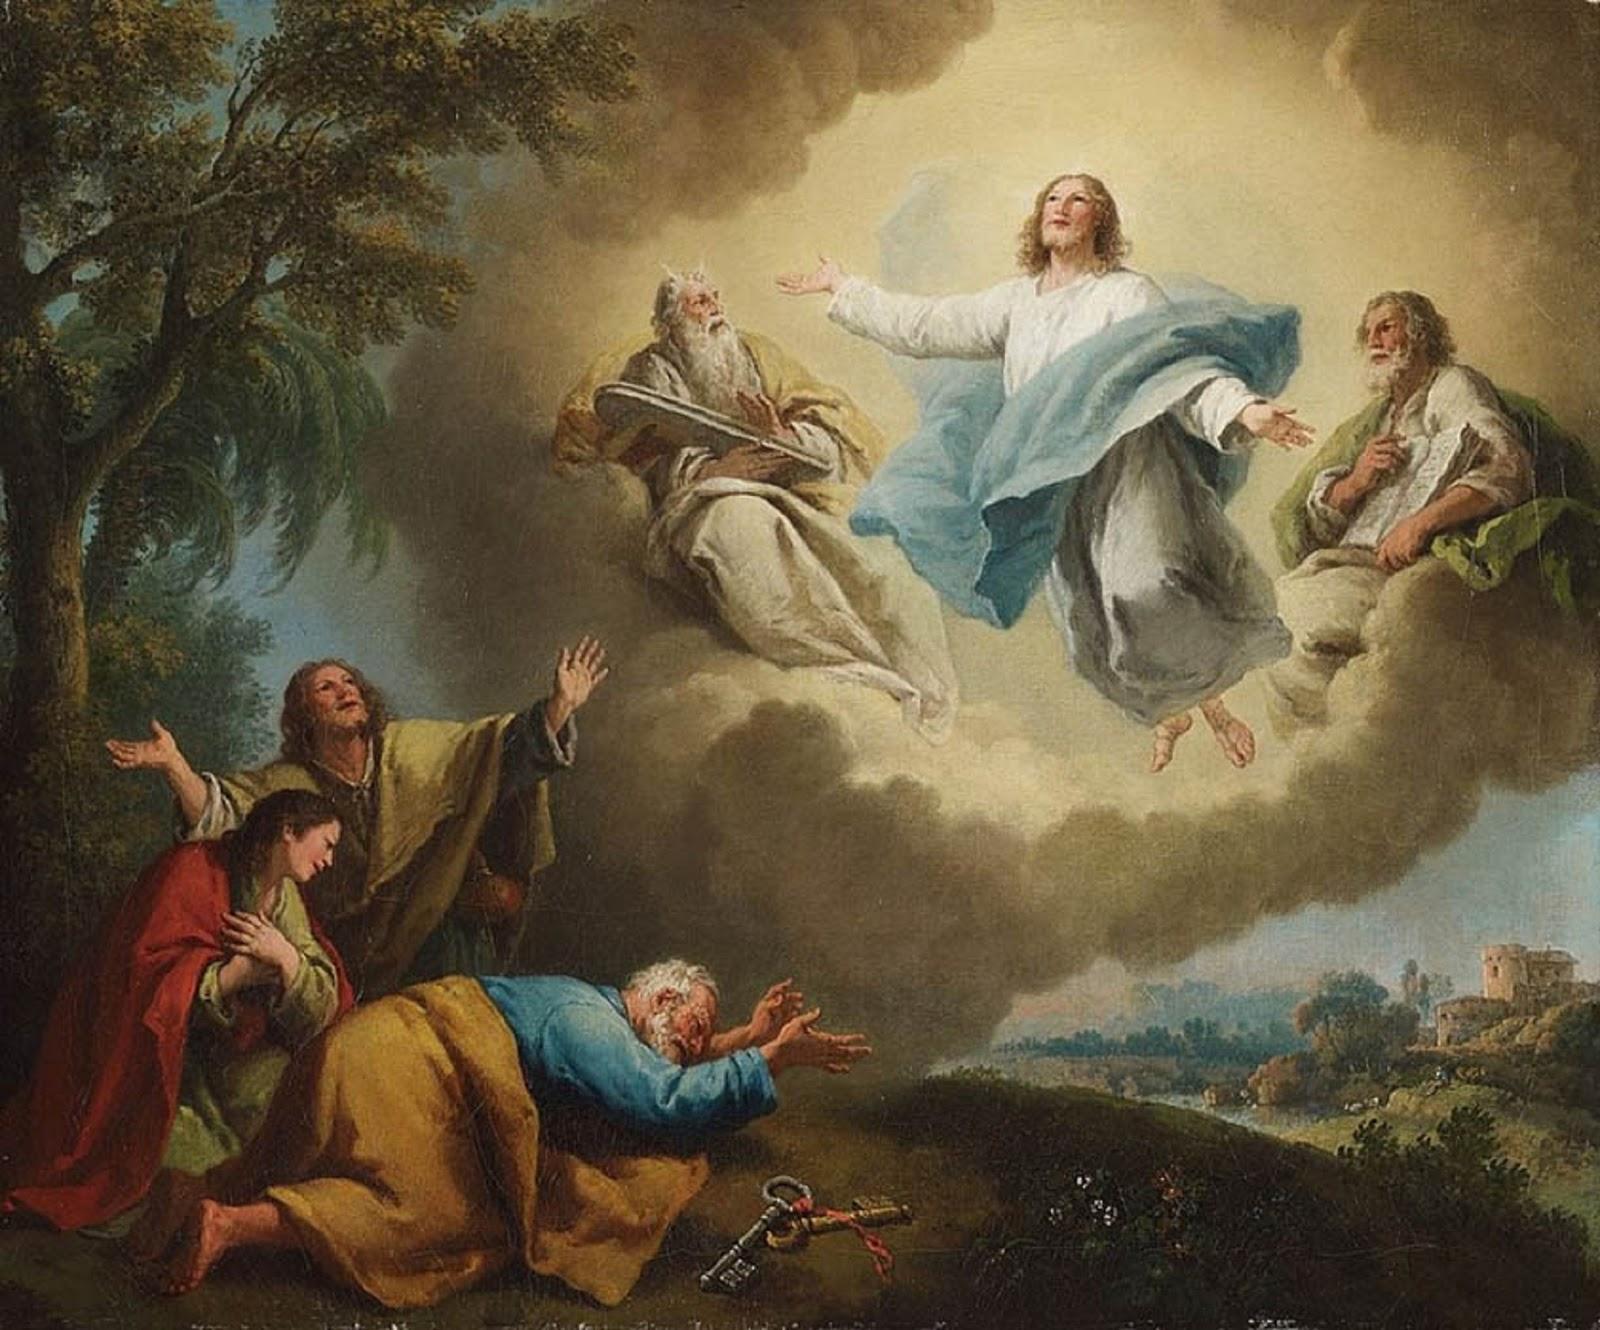 https://dimancheprochain.org/wp-content/uploads/2018/08/Transfiguration_g.jpg